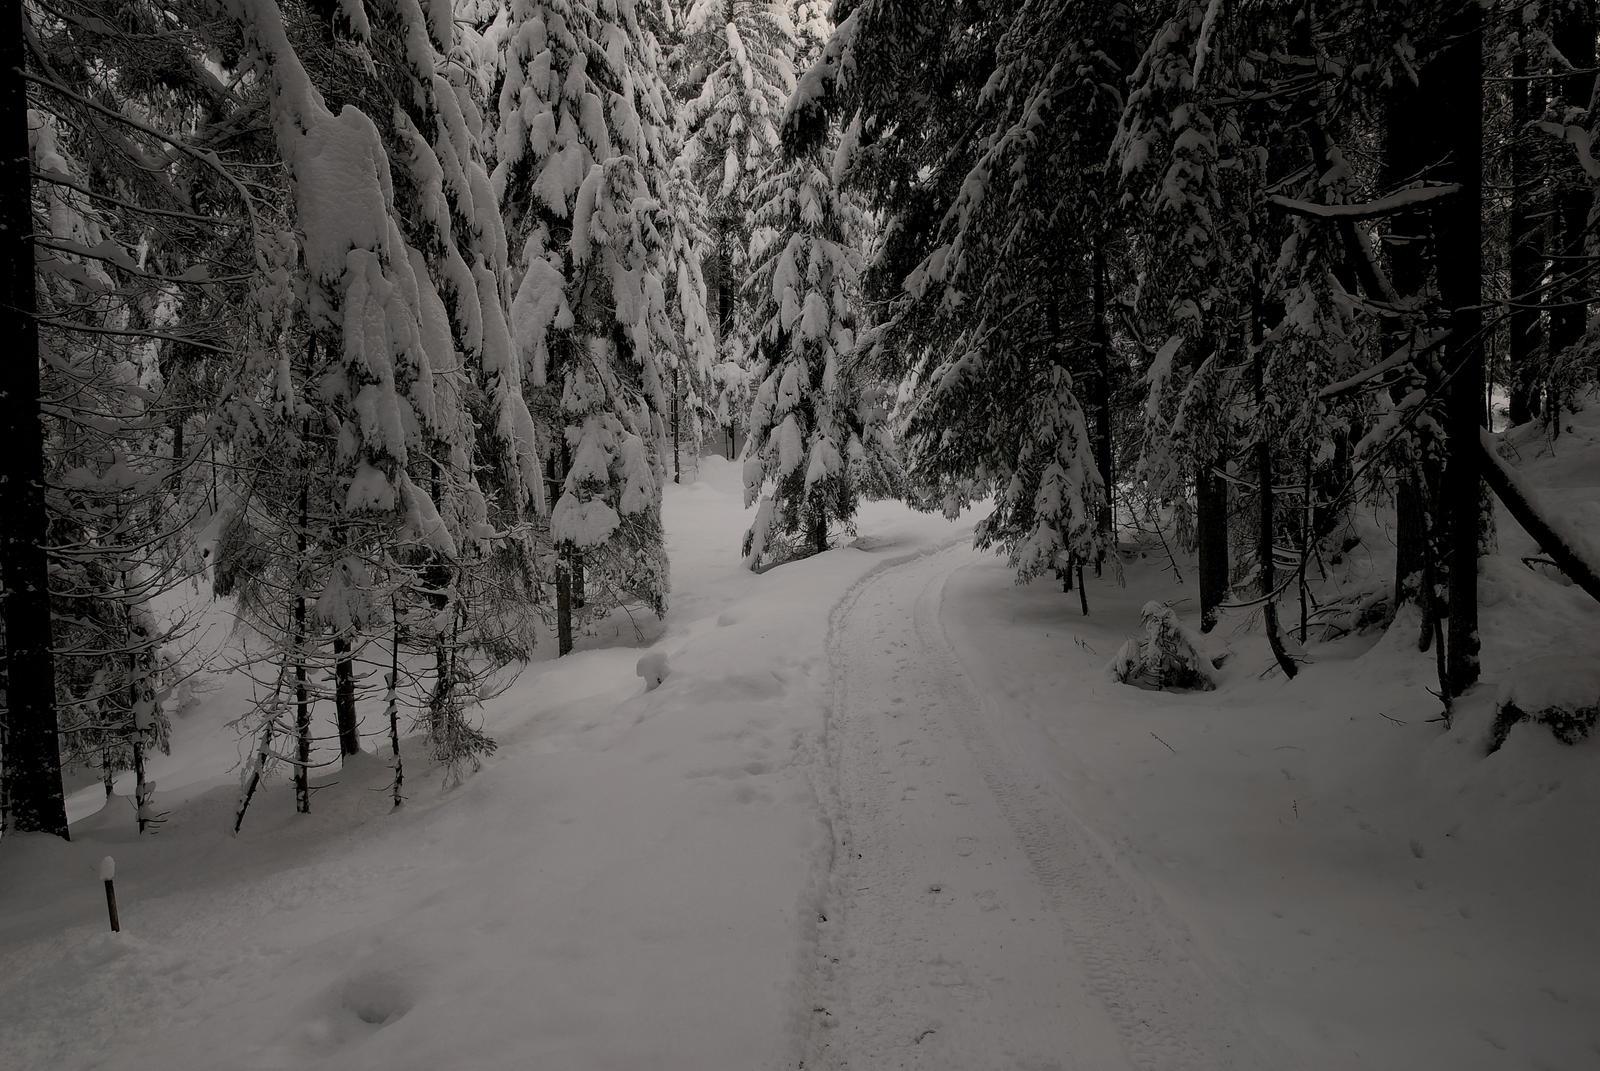 Old Man Winter by Burtn